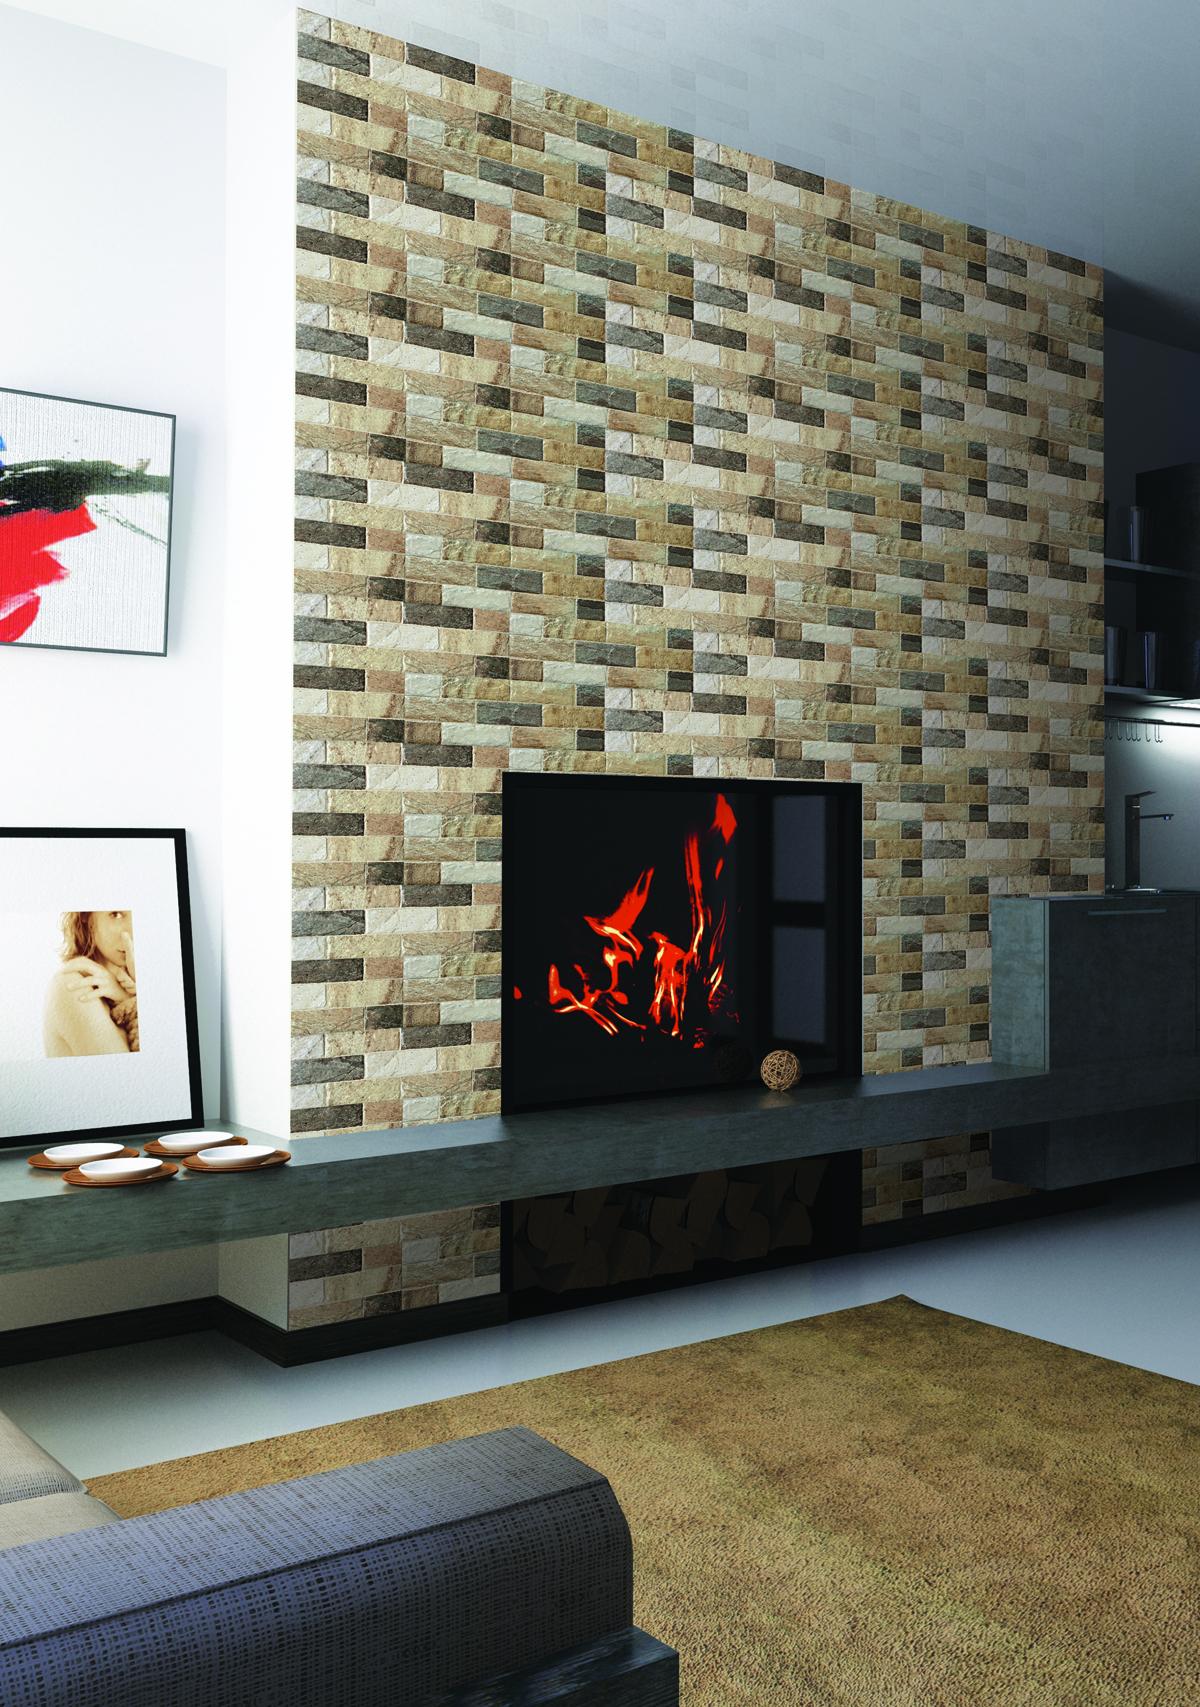 Johnson Launches Stonex Wall Tile Collection Atul Malikram Pr 24 7 Network Ltd